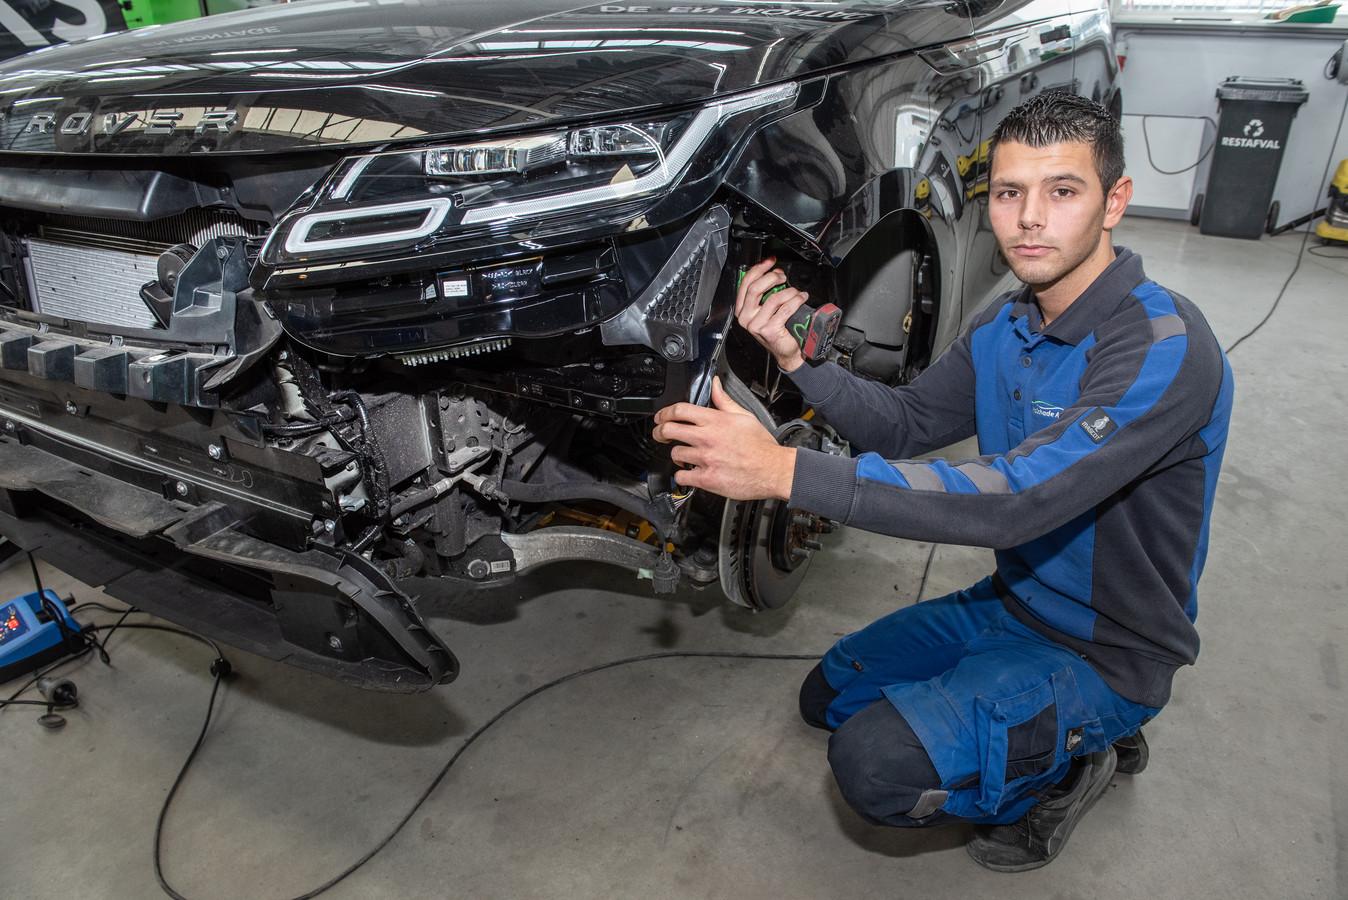 Manus Kwarten in de garage van Autoschade Herstel Arnhem.